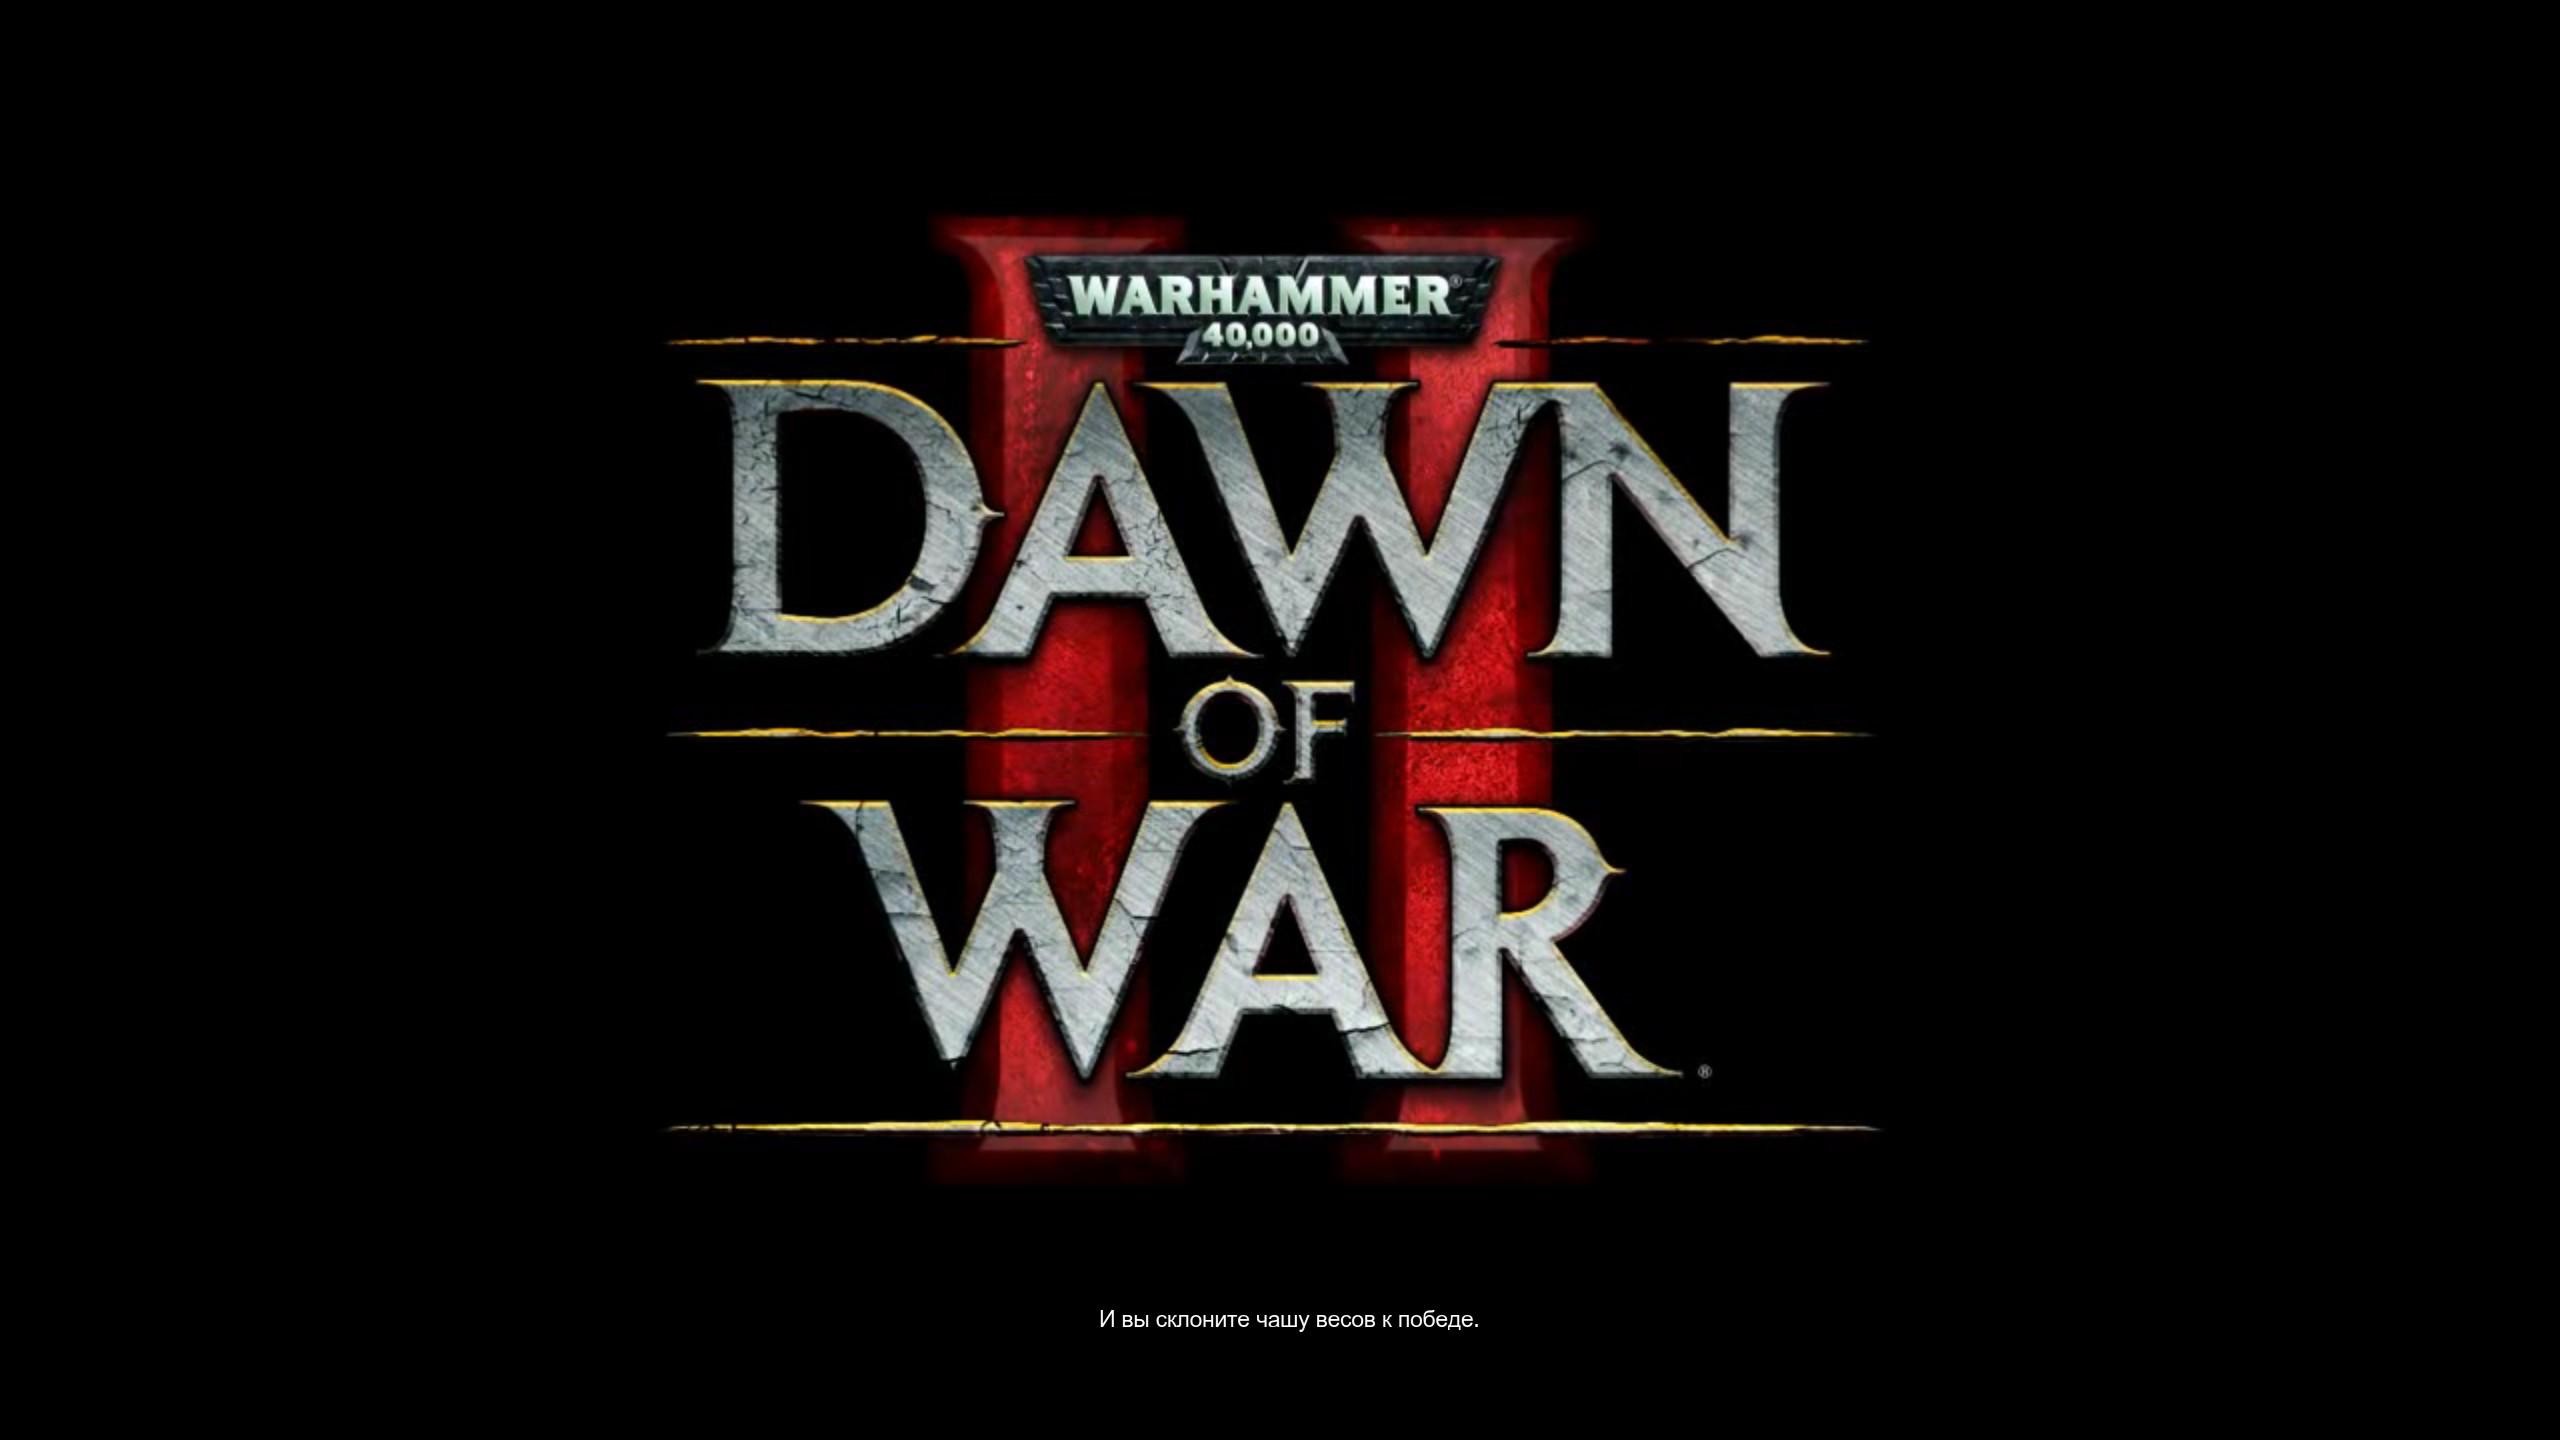 Возвращение в легенду #15 Warhammer 40,000: Dawn of War II. - Изображение 1